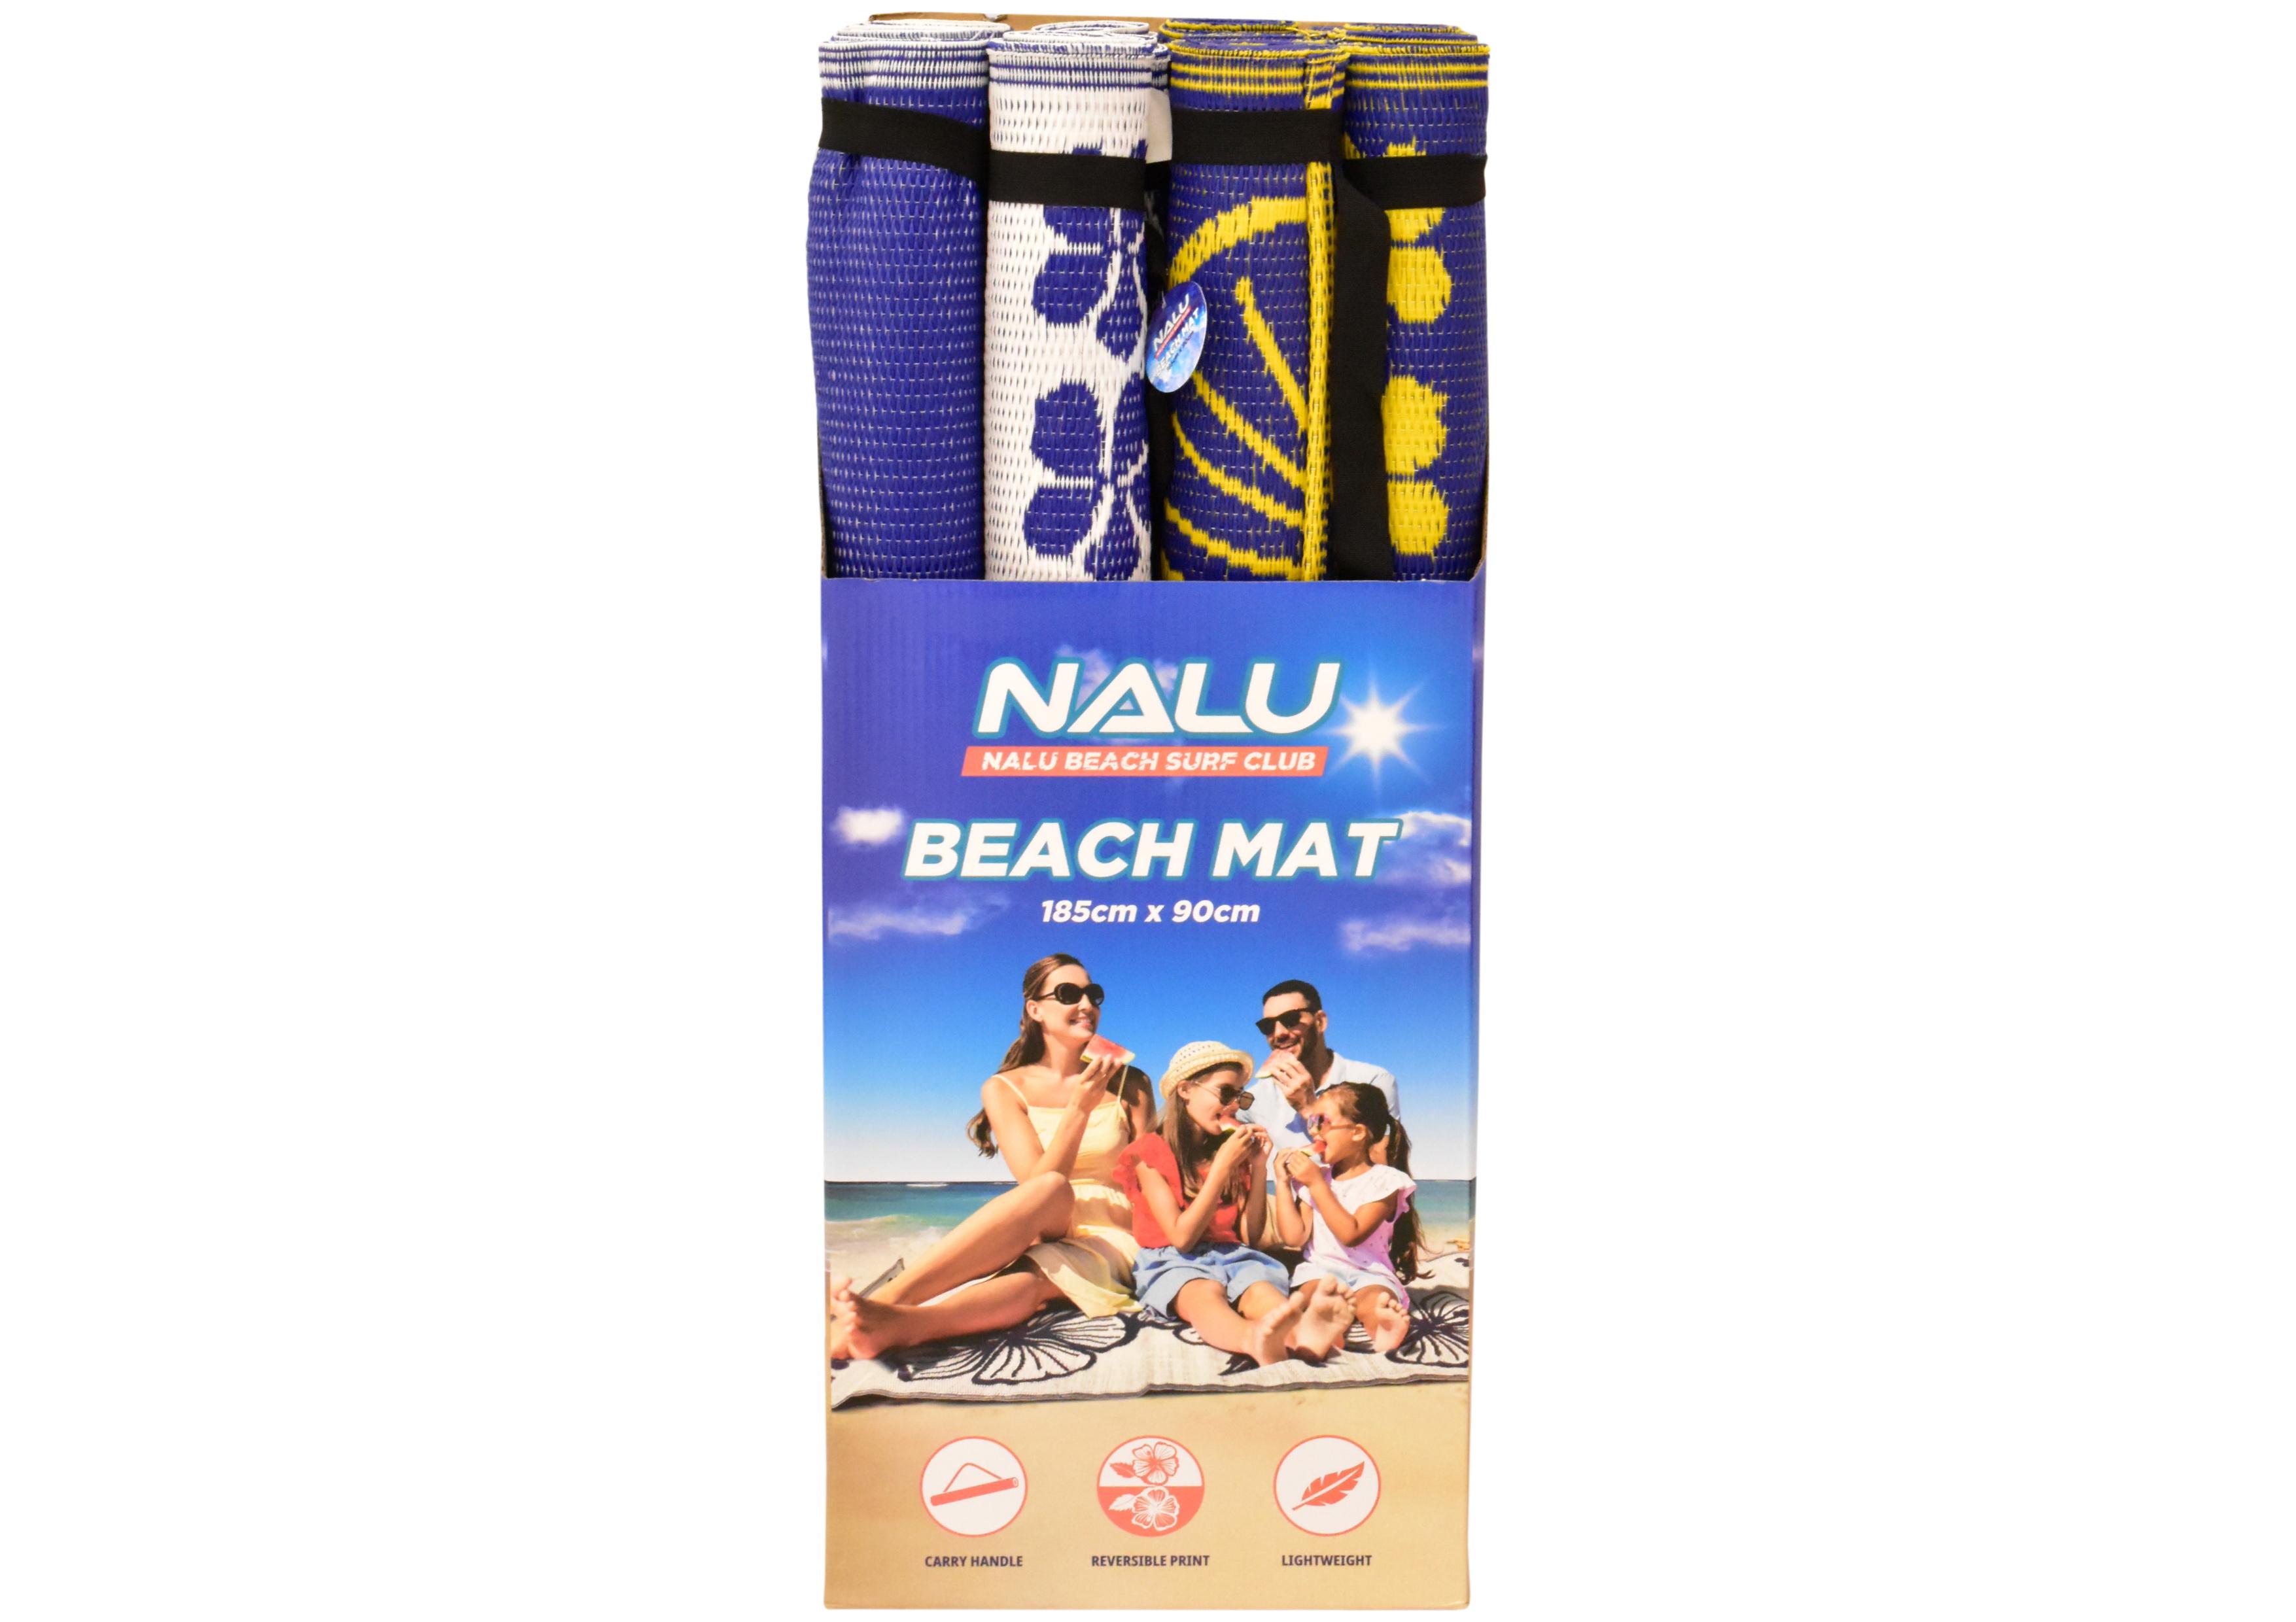 90cm x 185cm Rolled Pvc Beach Mat In Display Box